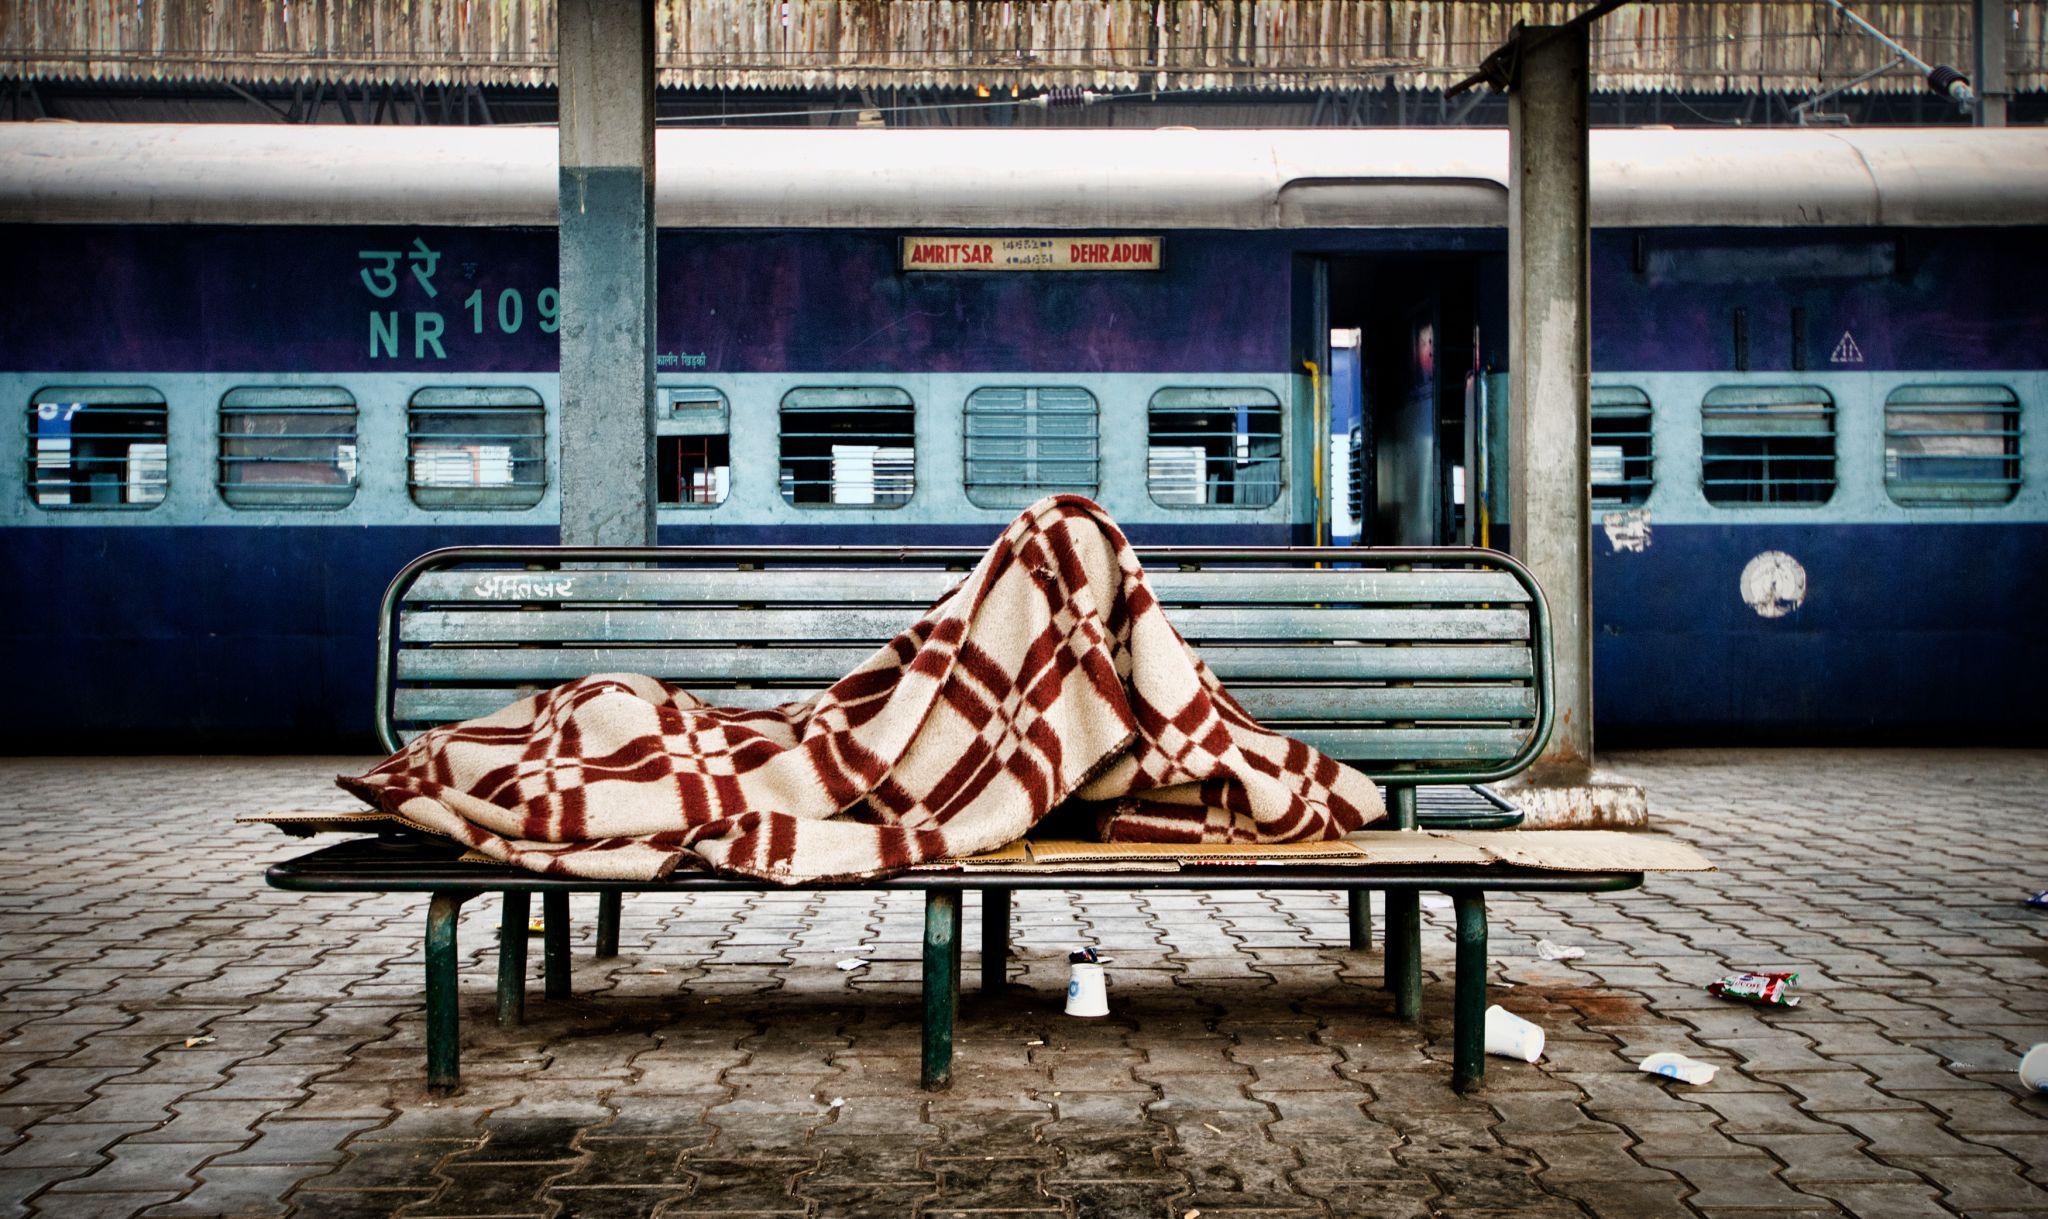 Amritsar Train Station, India